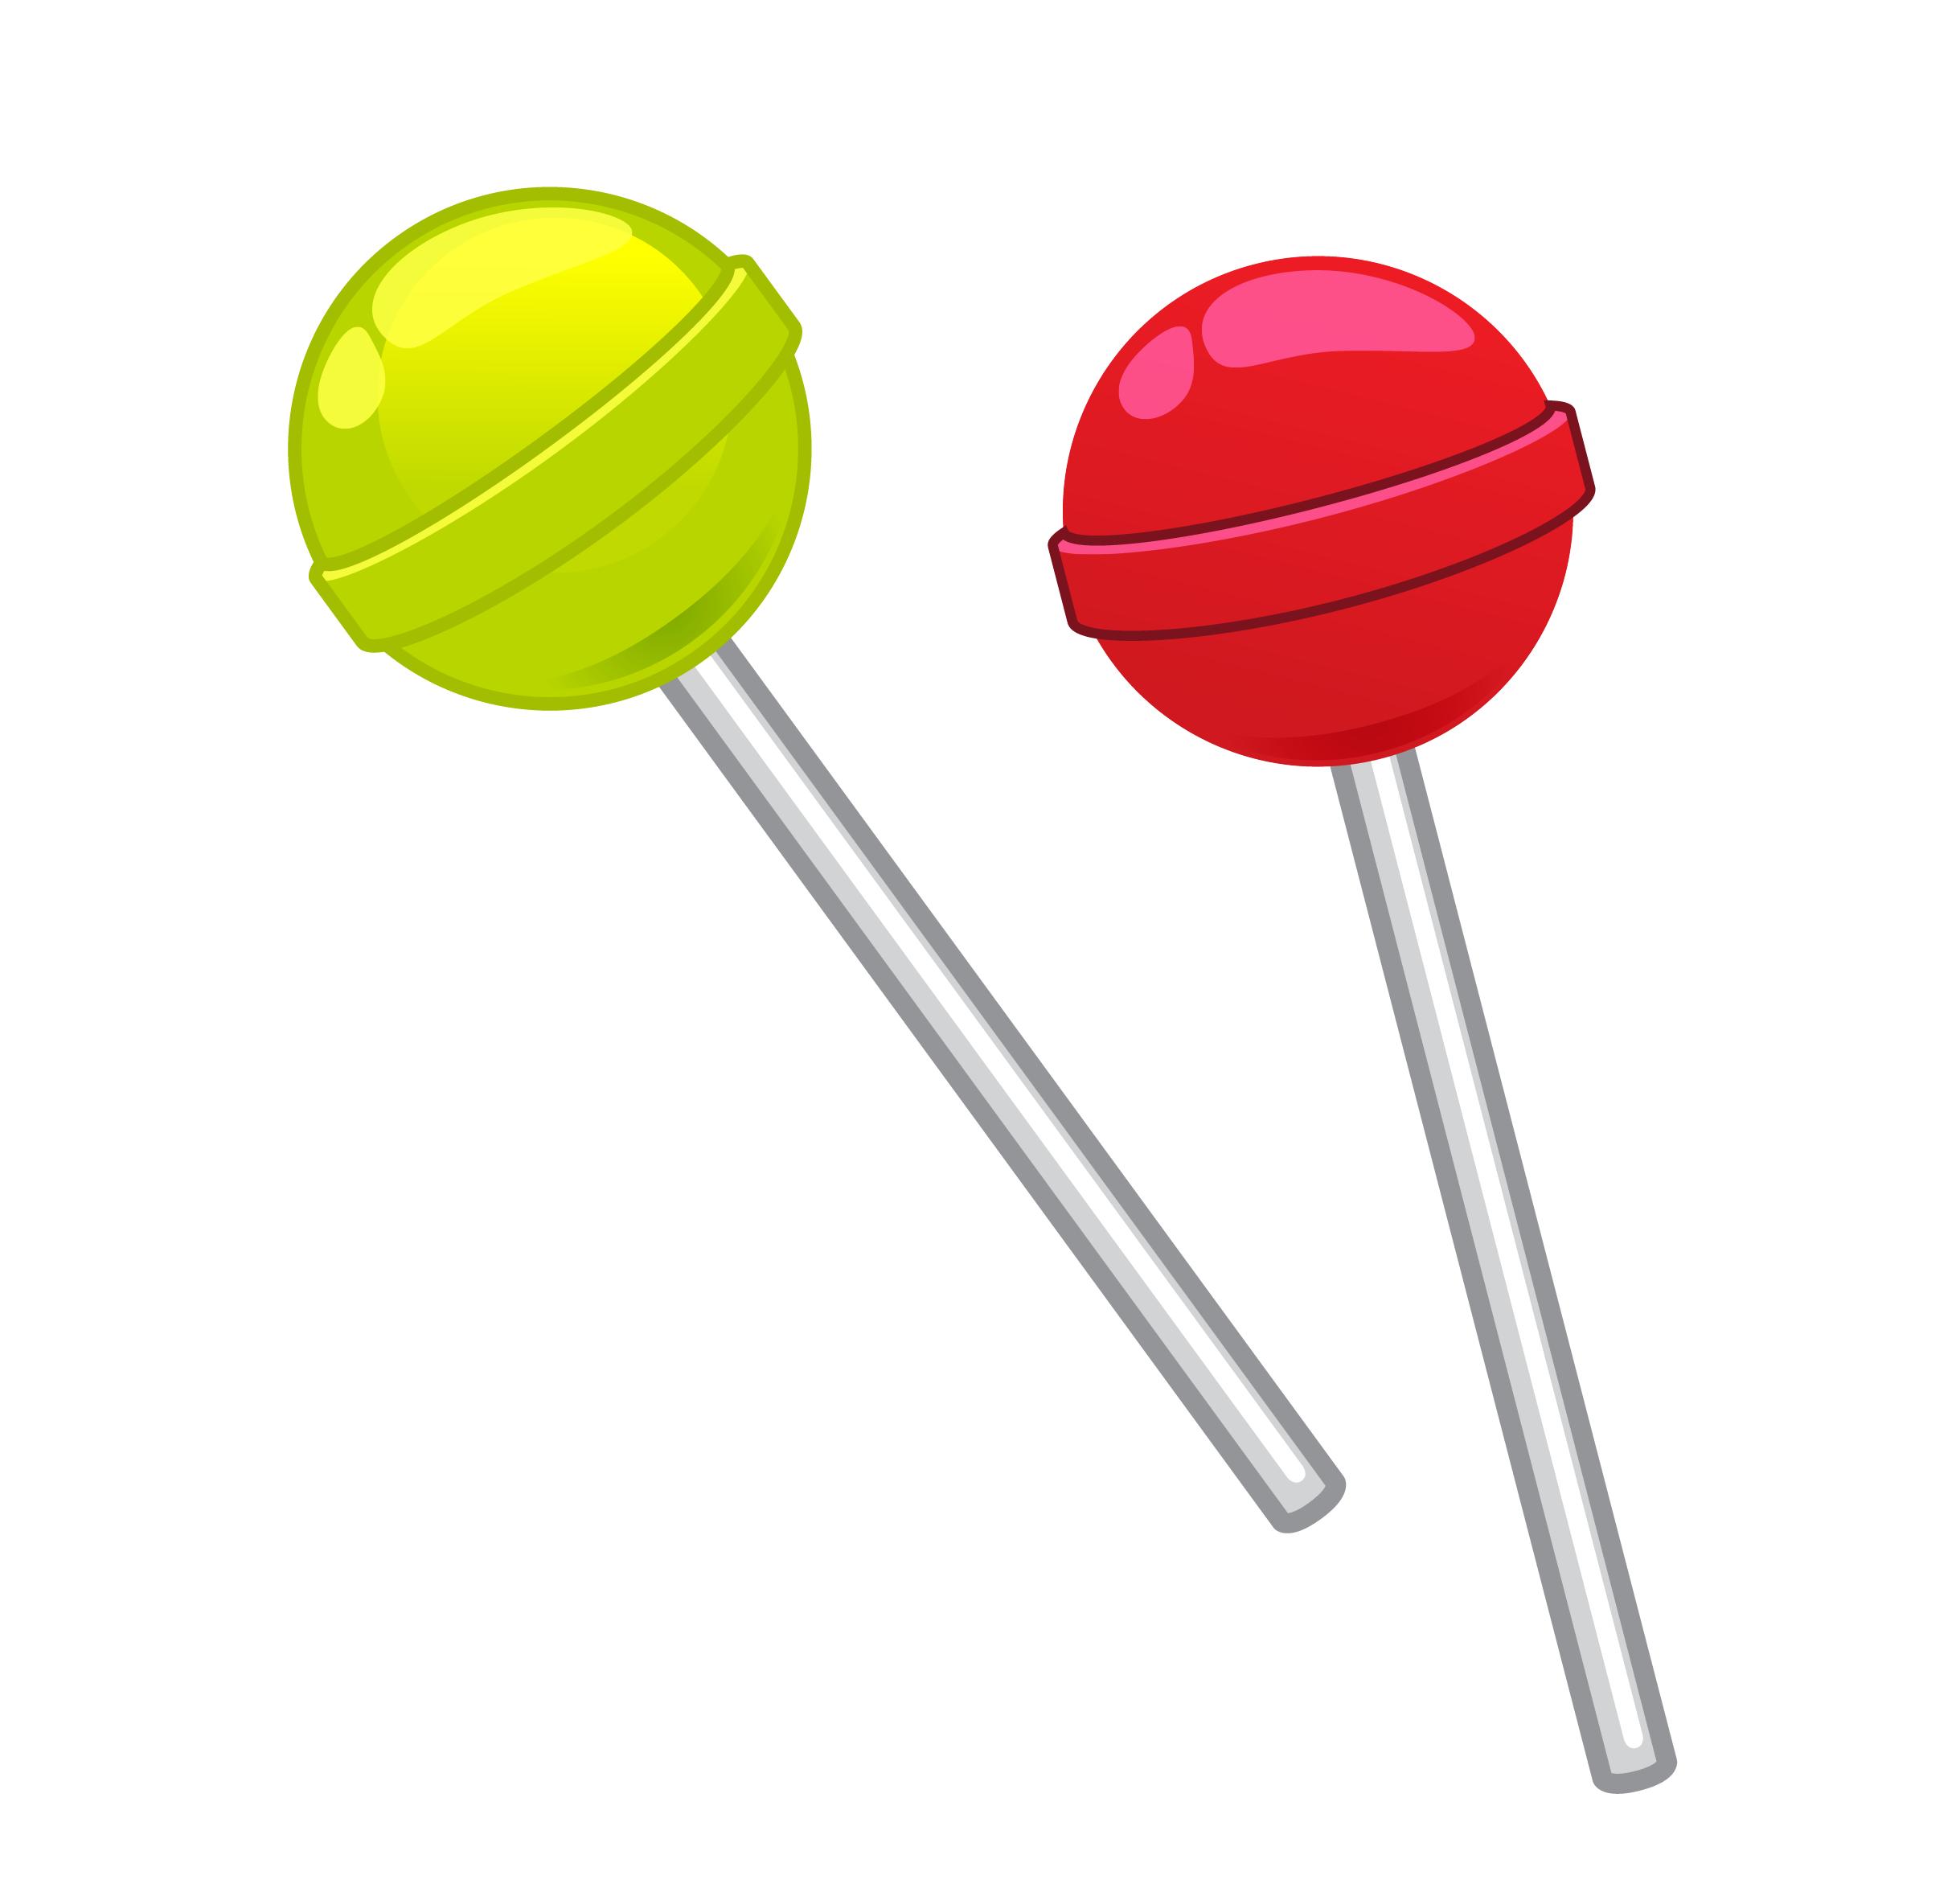 Lollipop clipart jar. Clip art transprent png